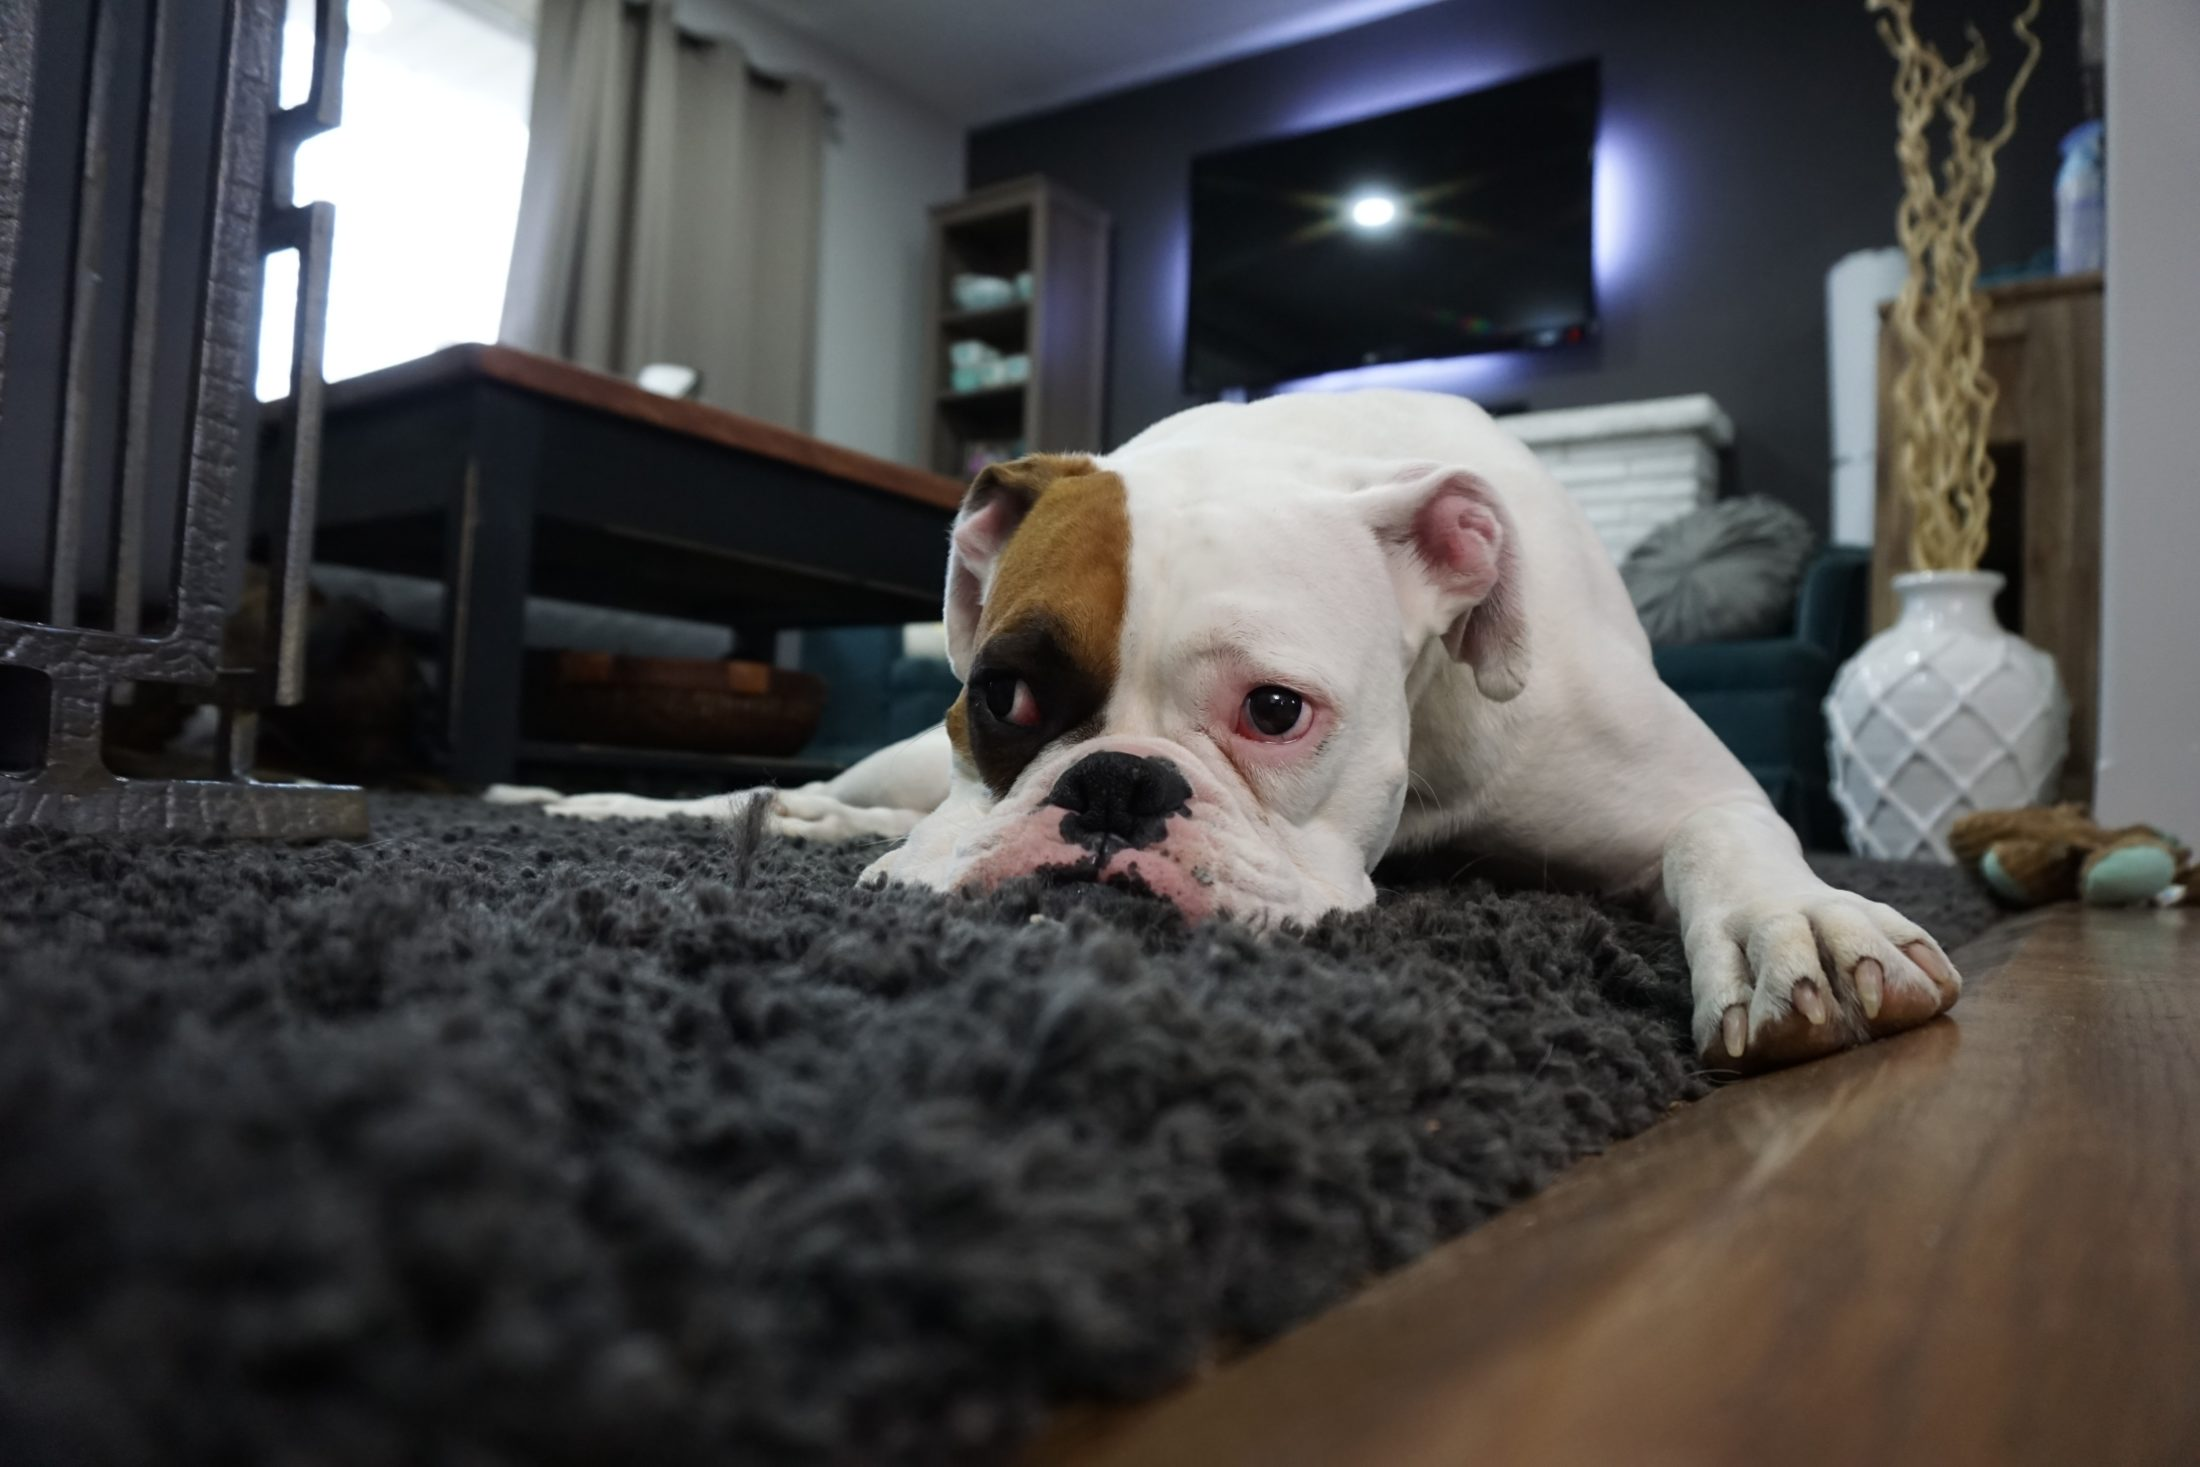 buldogue ingl6es deitado no tapete da sala